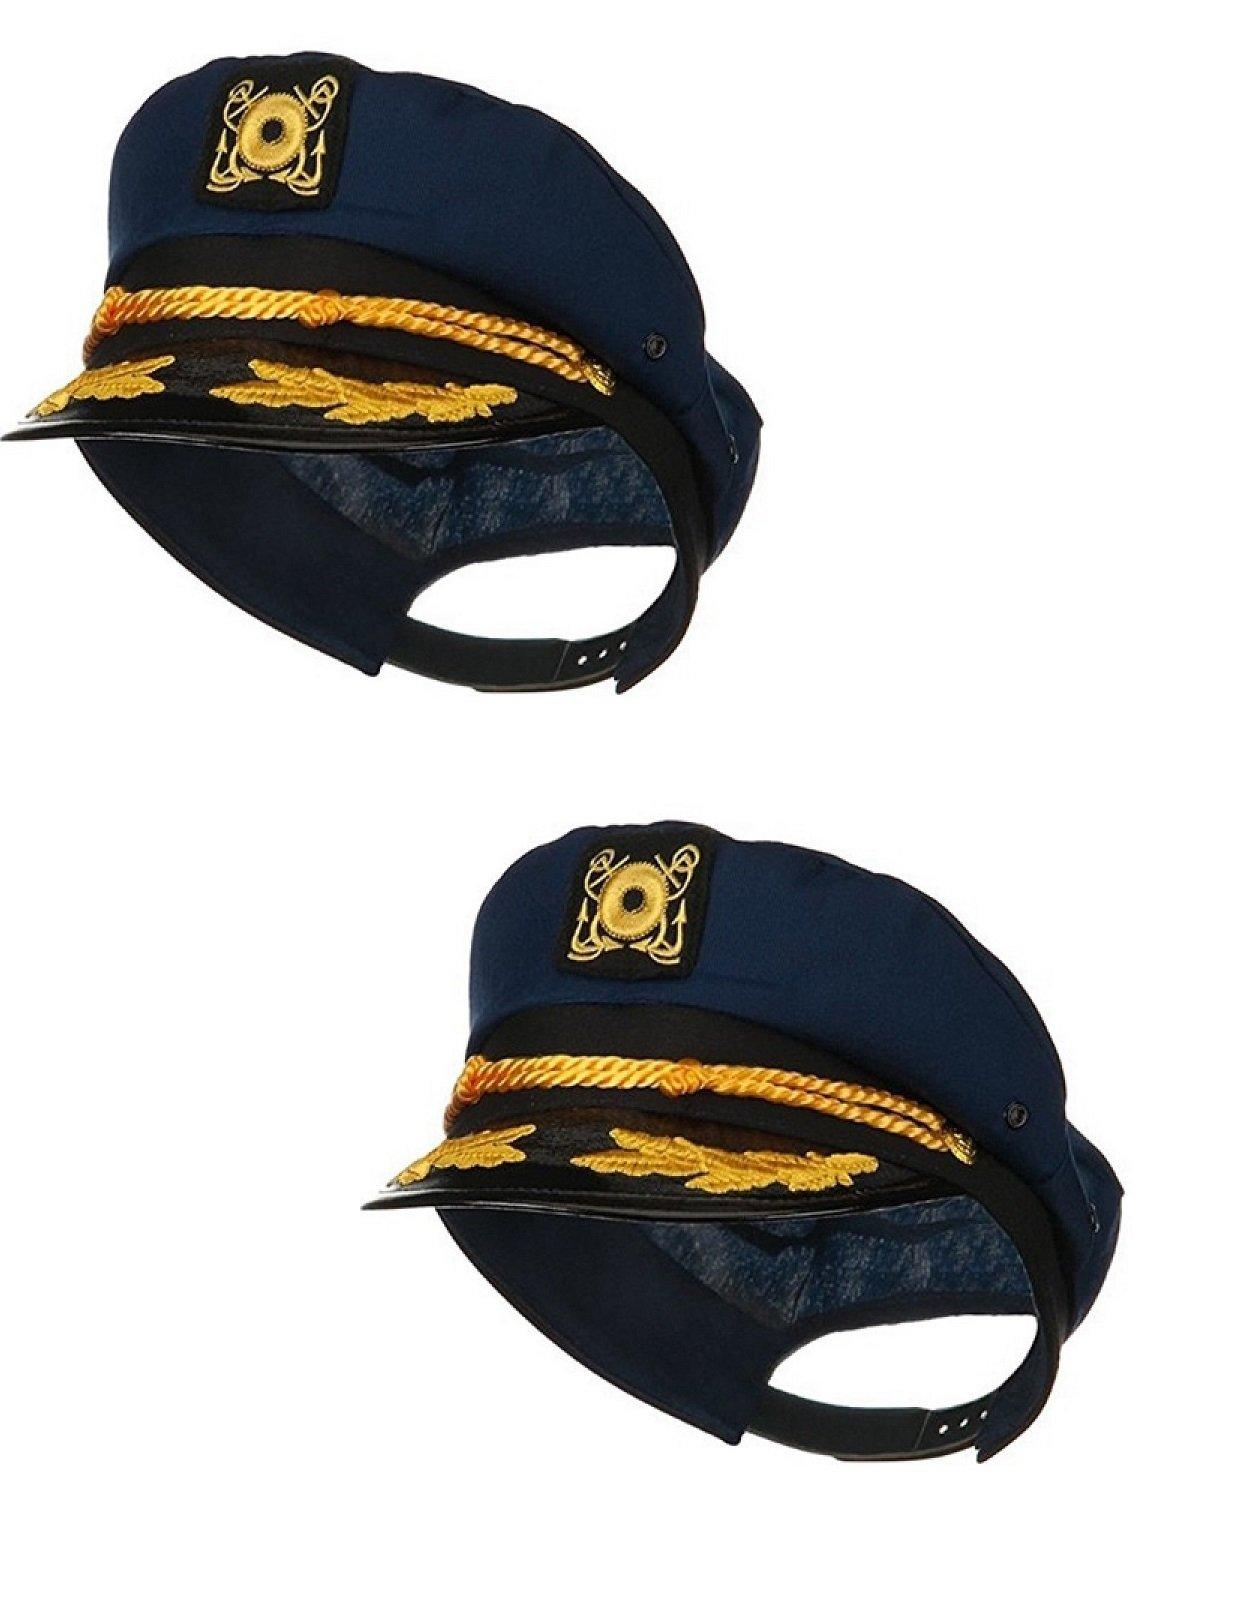 Nicky Bigs Novelties Navy Skipper Sailor Ship Yacht Boat Captain Hat Marines Admiral Blue Gold 2 Pack